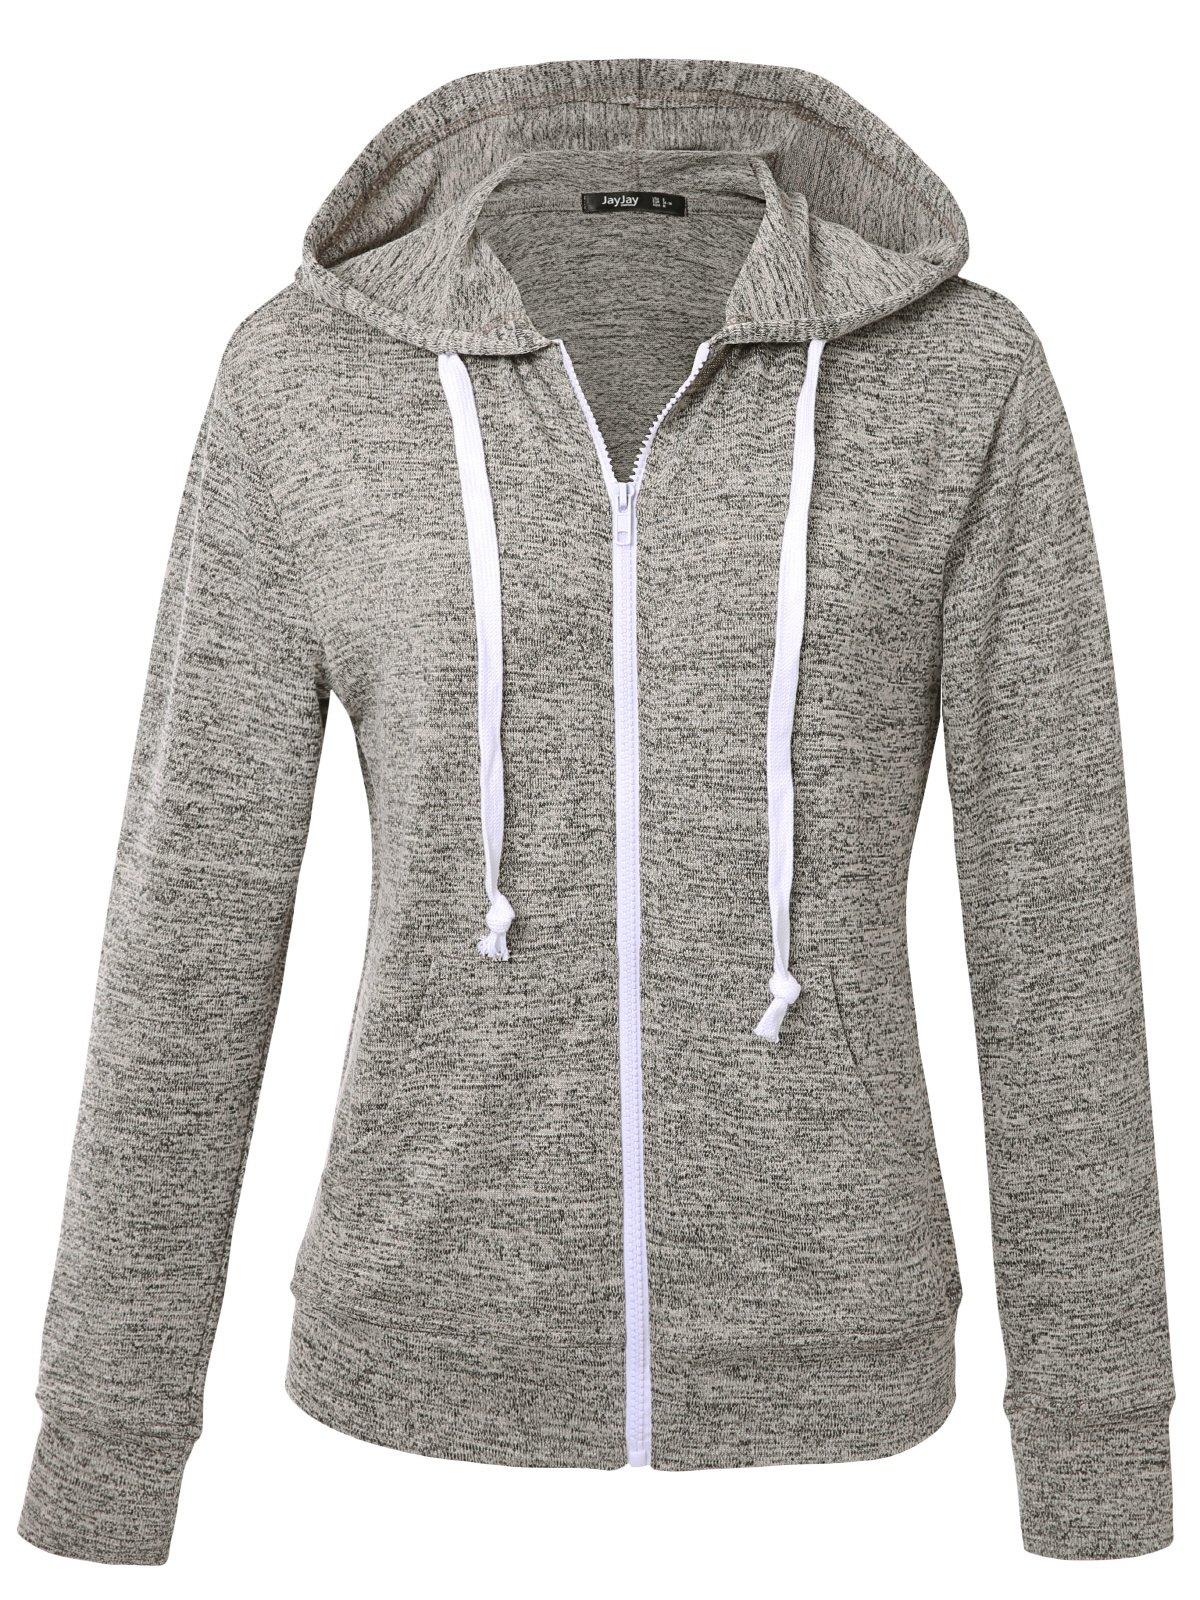 JayJay Women Athlete Stretchy Full Zip Jersey Fashion Running Hoodie Long Sleeve Jacket,KNITGRAY,2XL